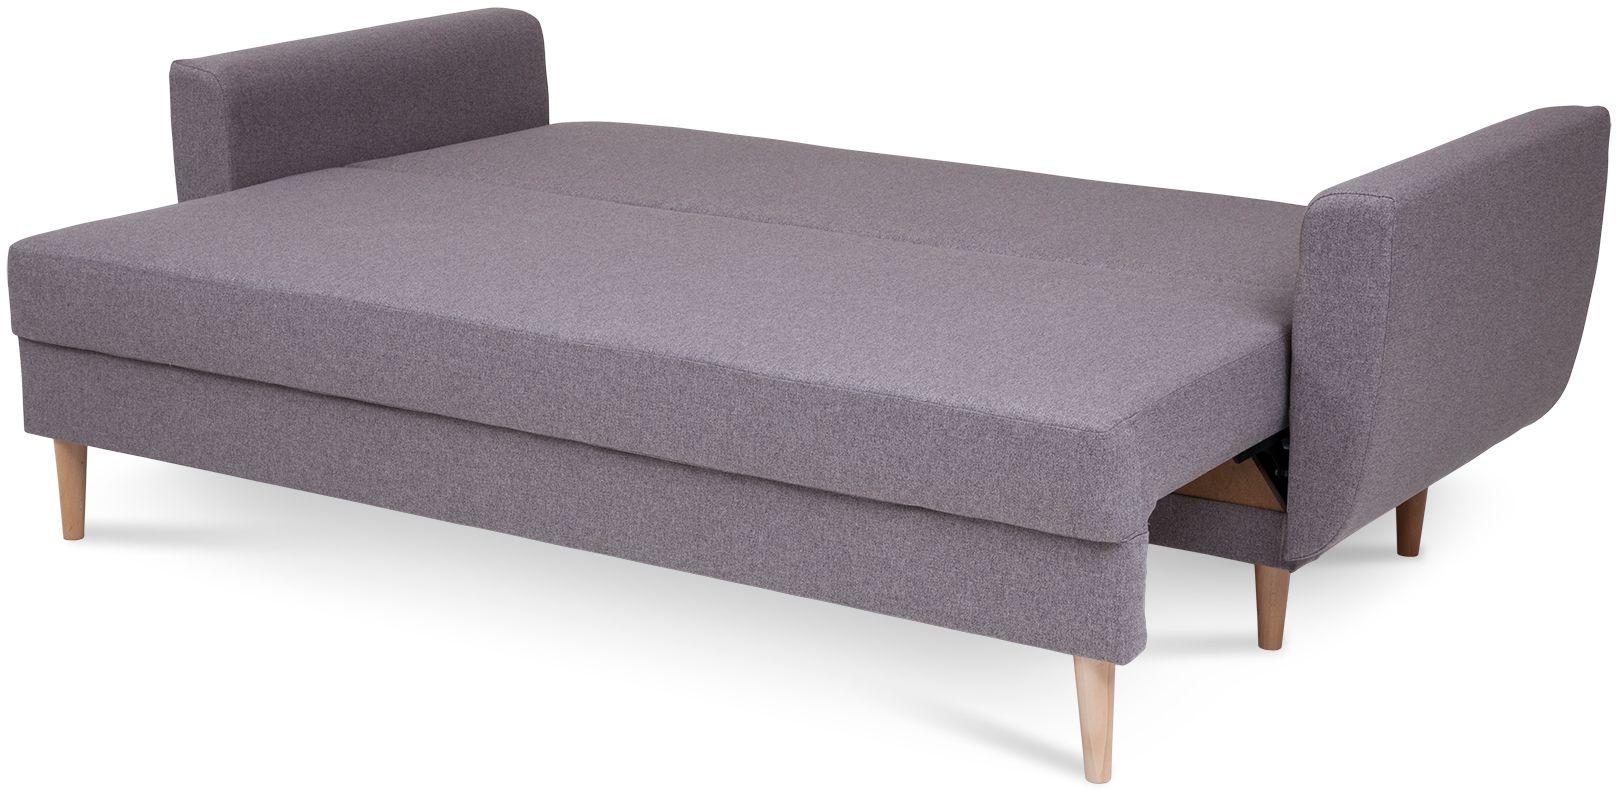 sofa diora 11